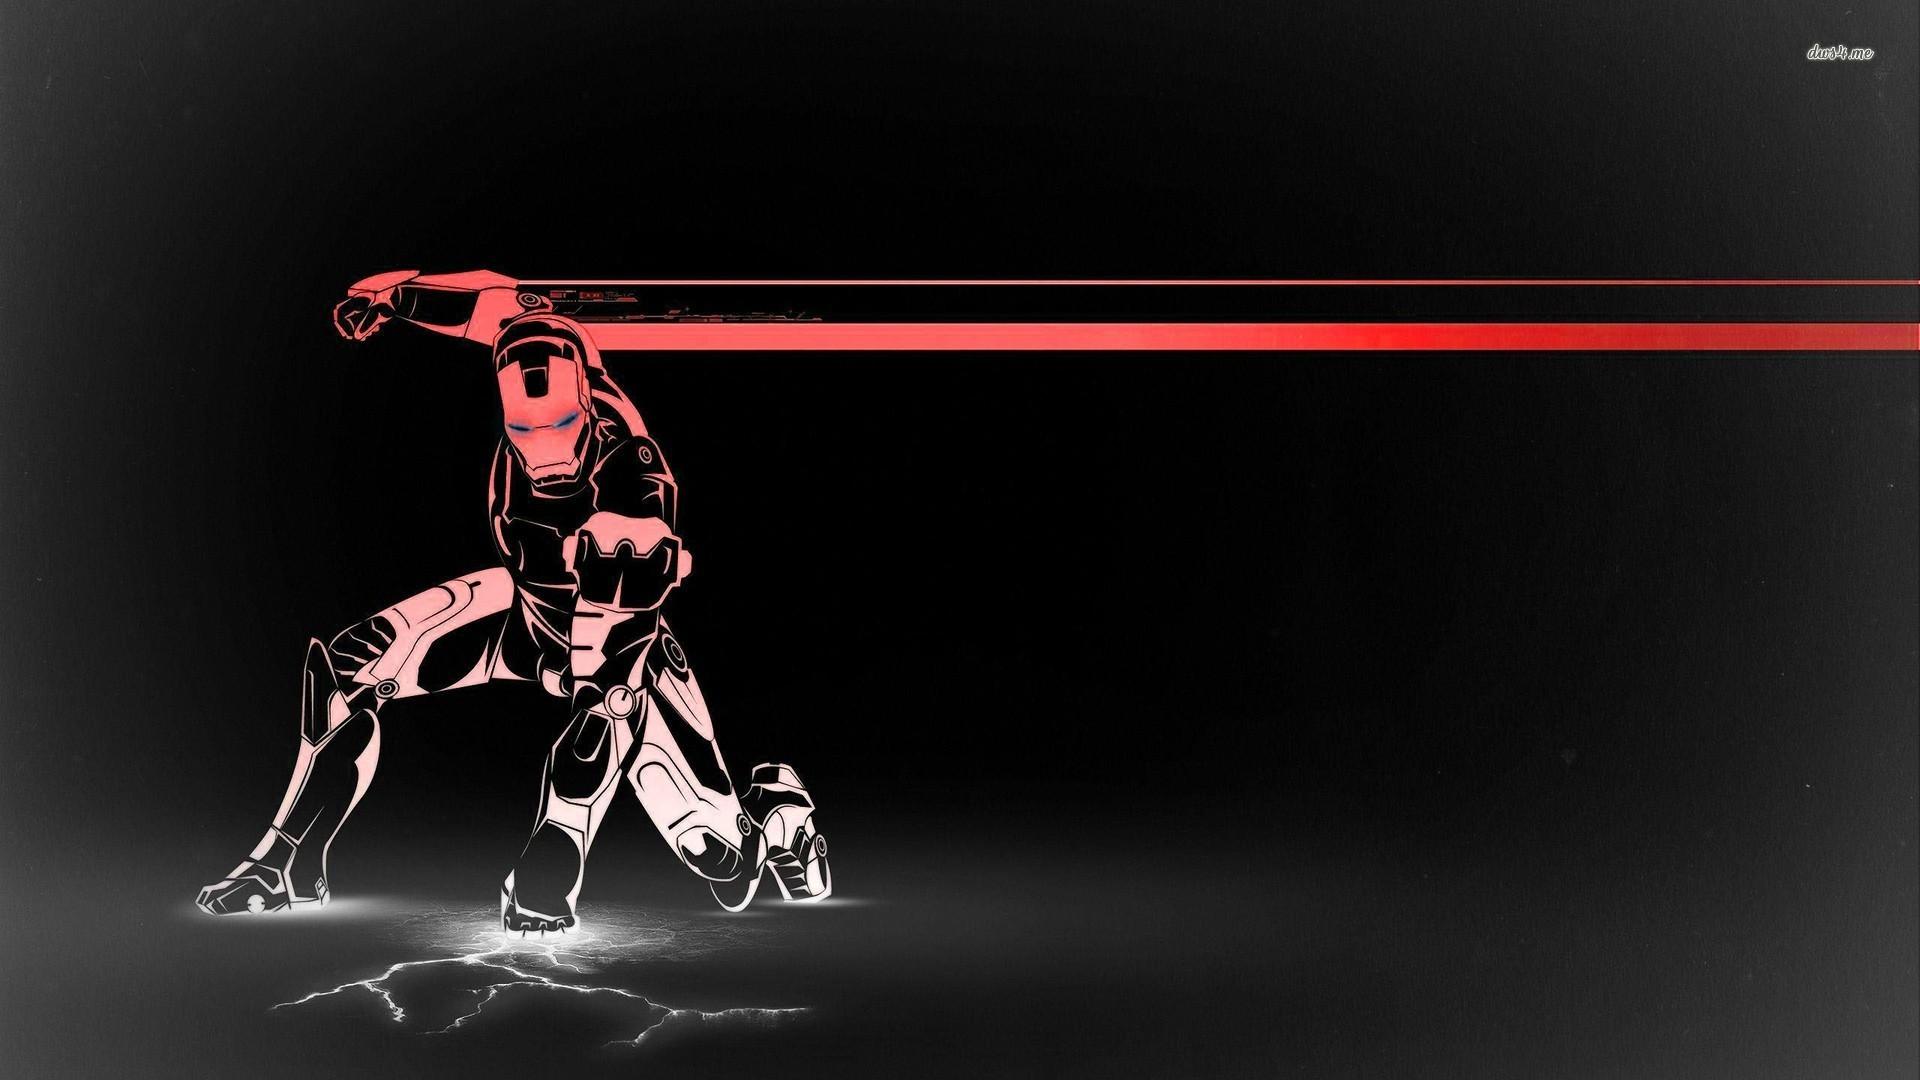 70 Iron Man Jarvis Animated